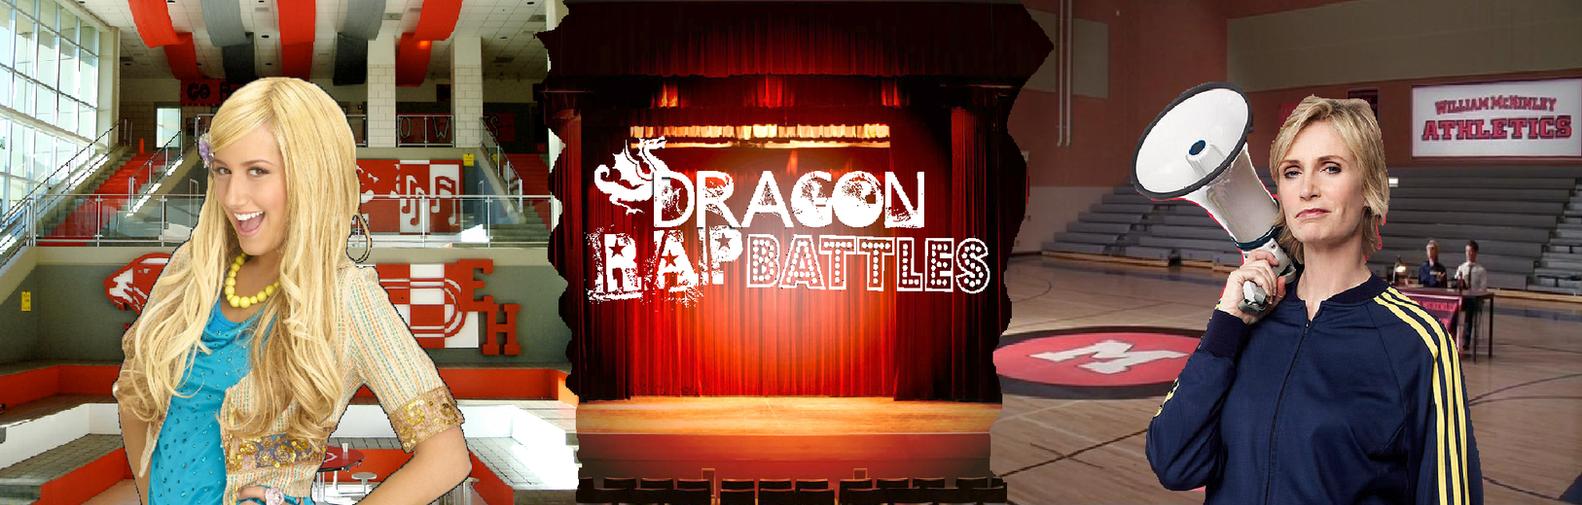 Sue Sylvester VS Sharpay Evans by dragonsblood23